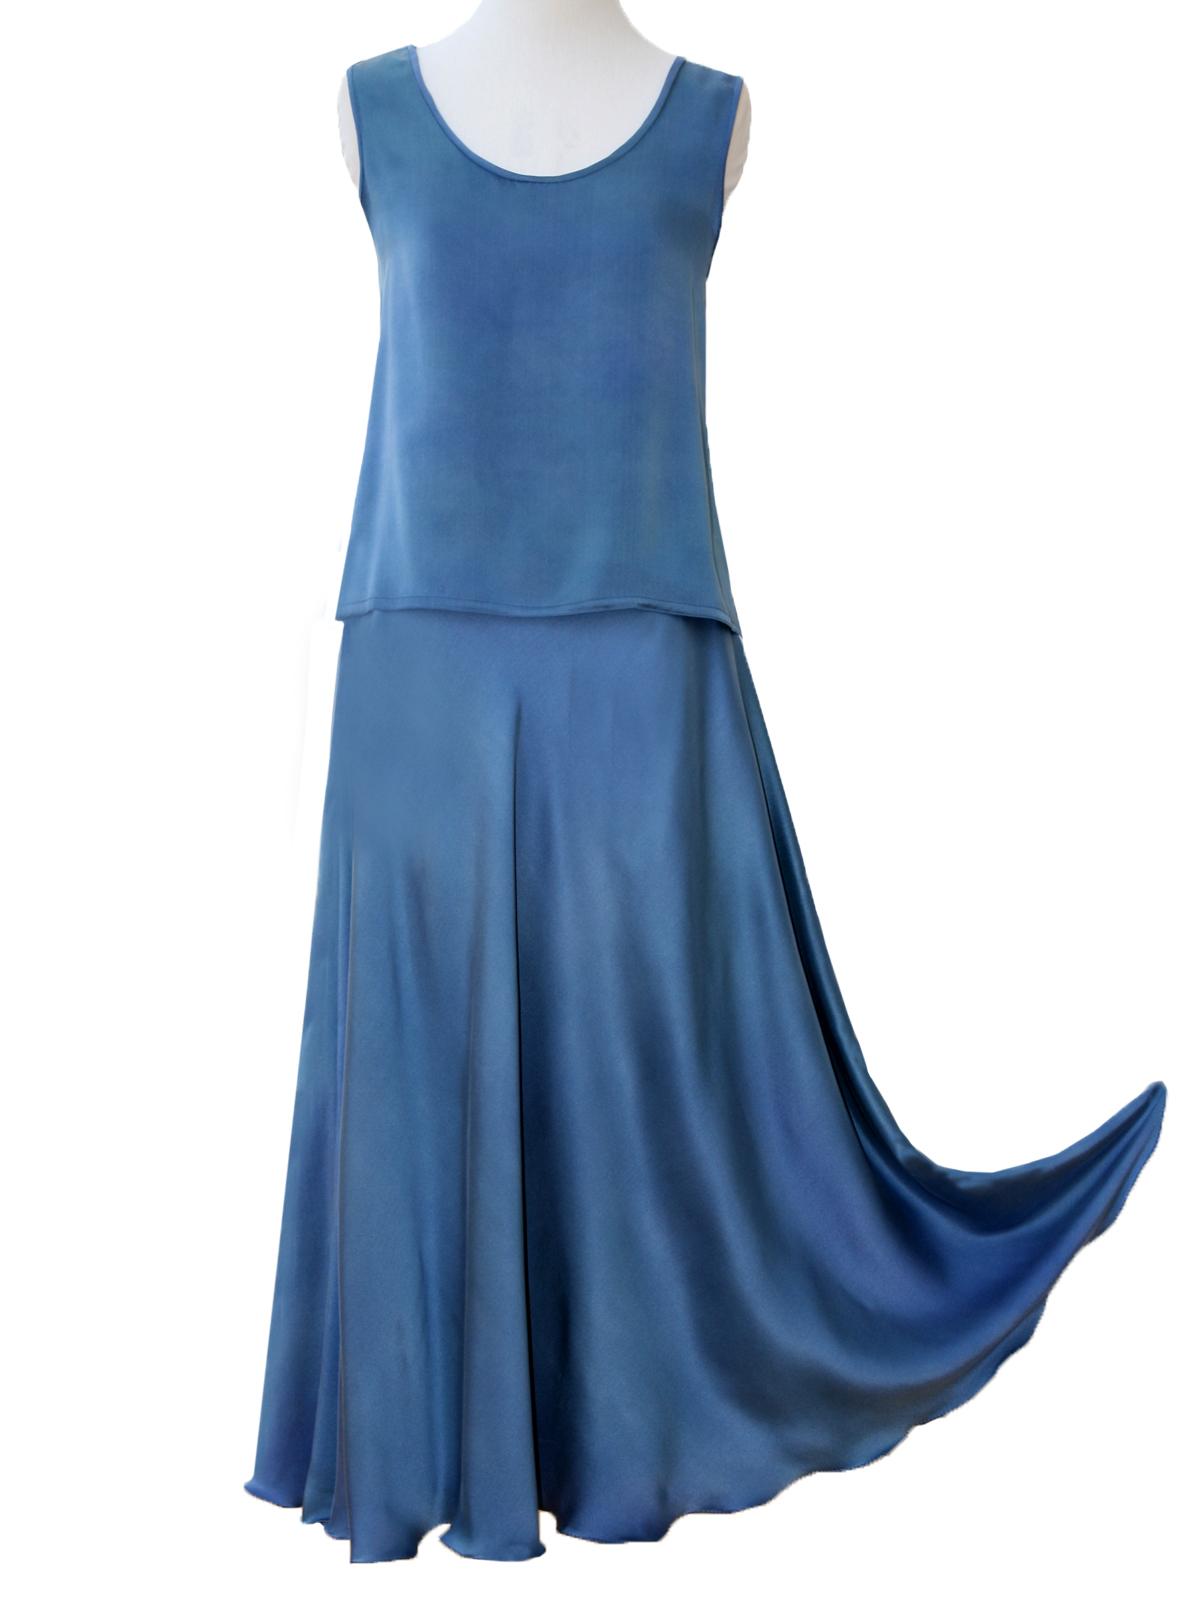 Vest Tabard Top & Bias Skirt -6624